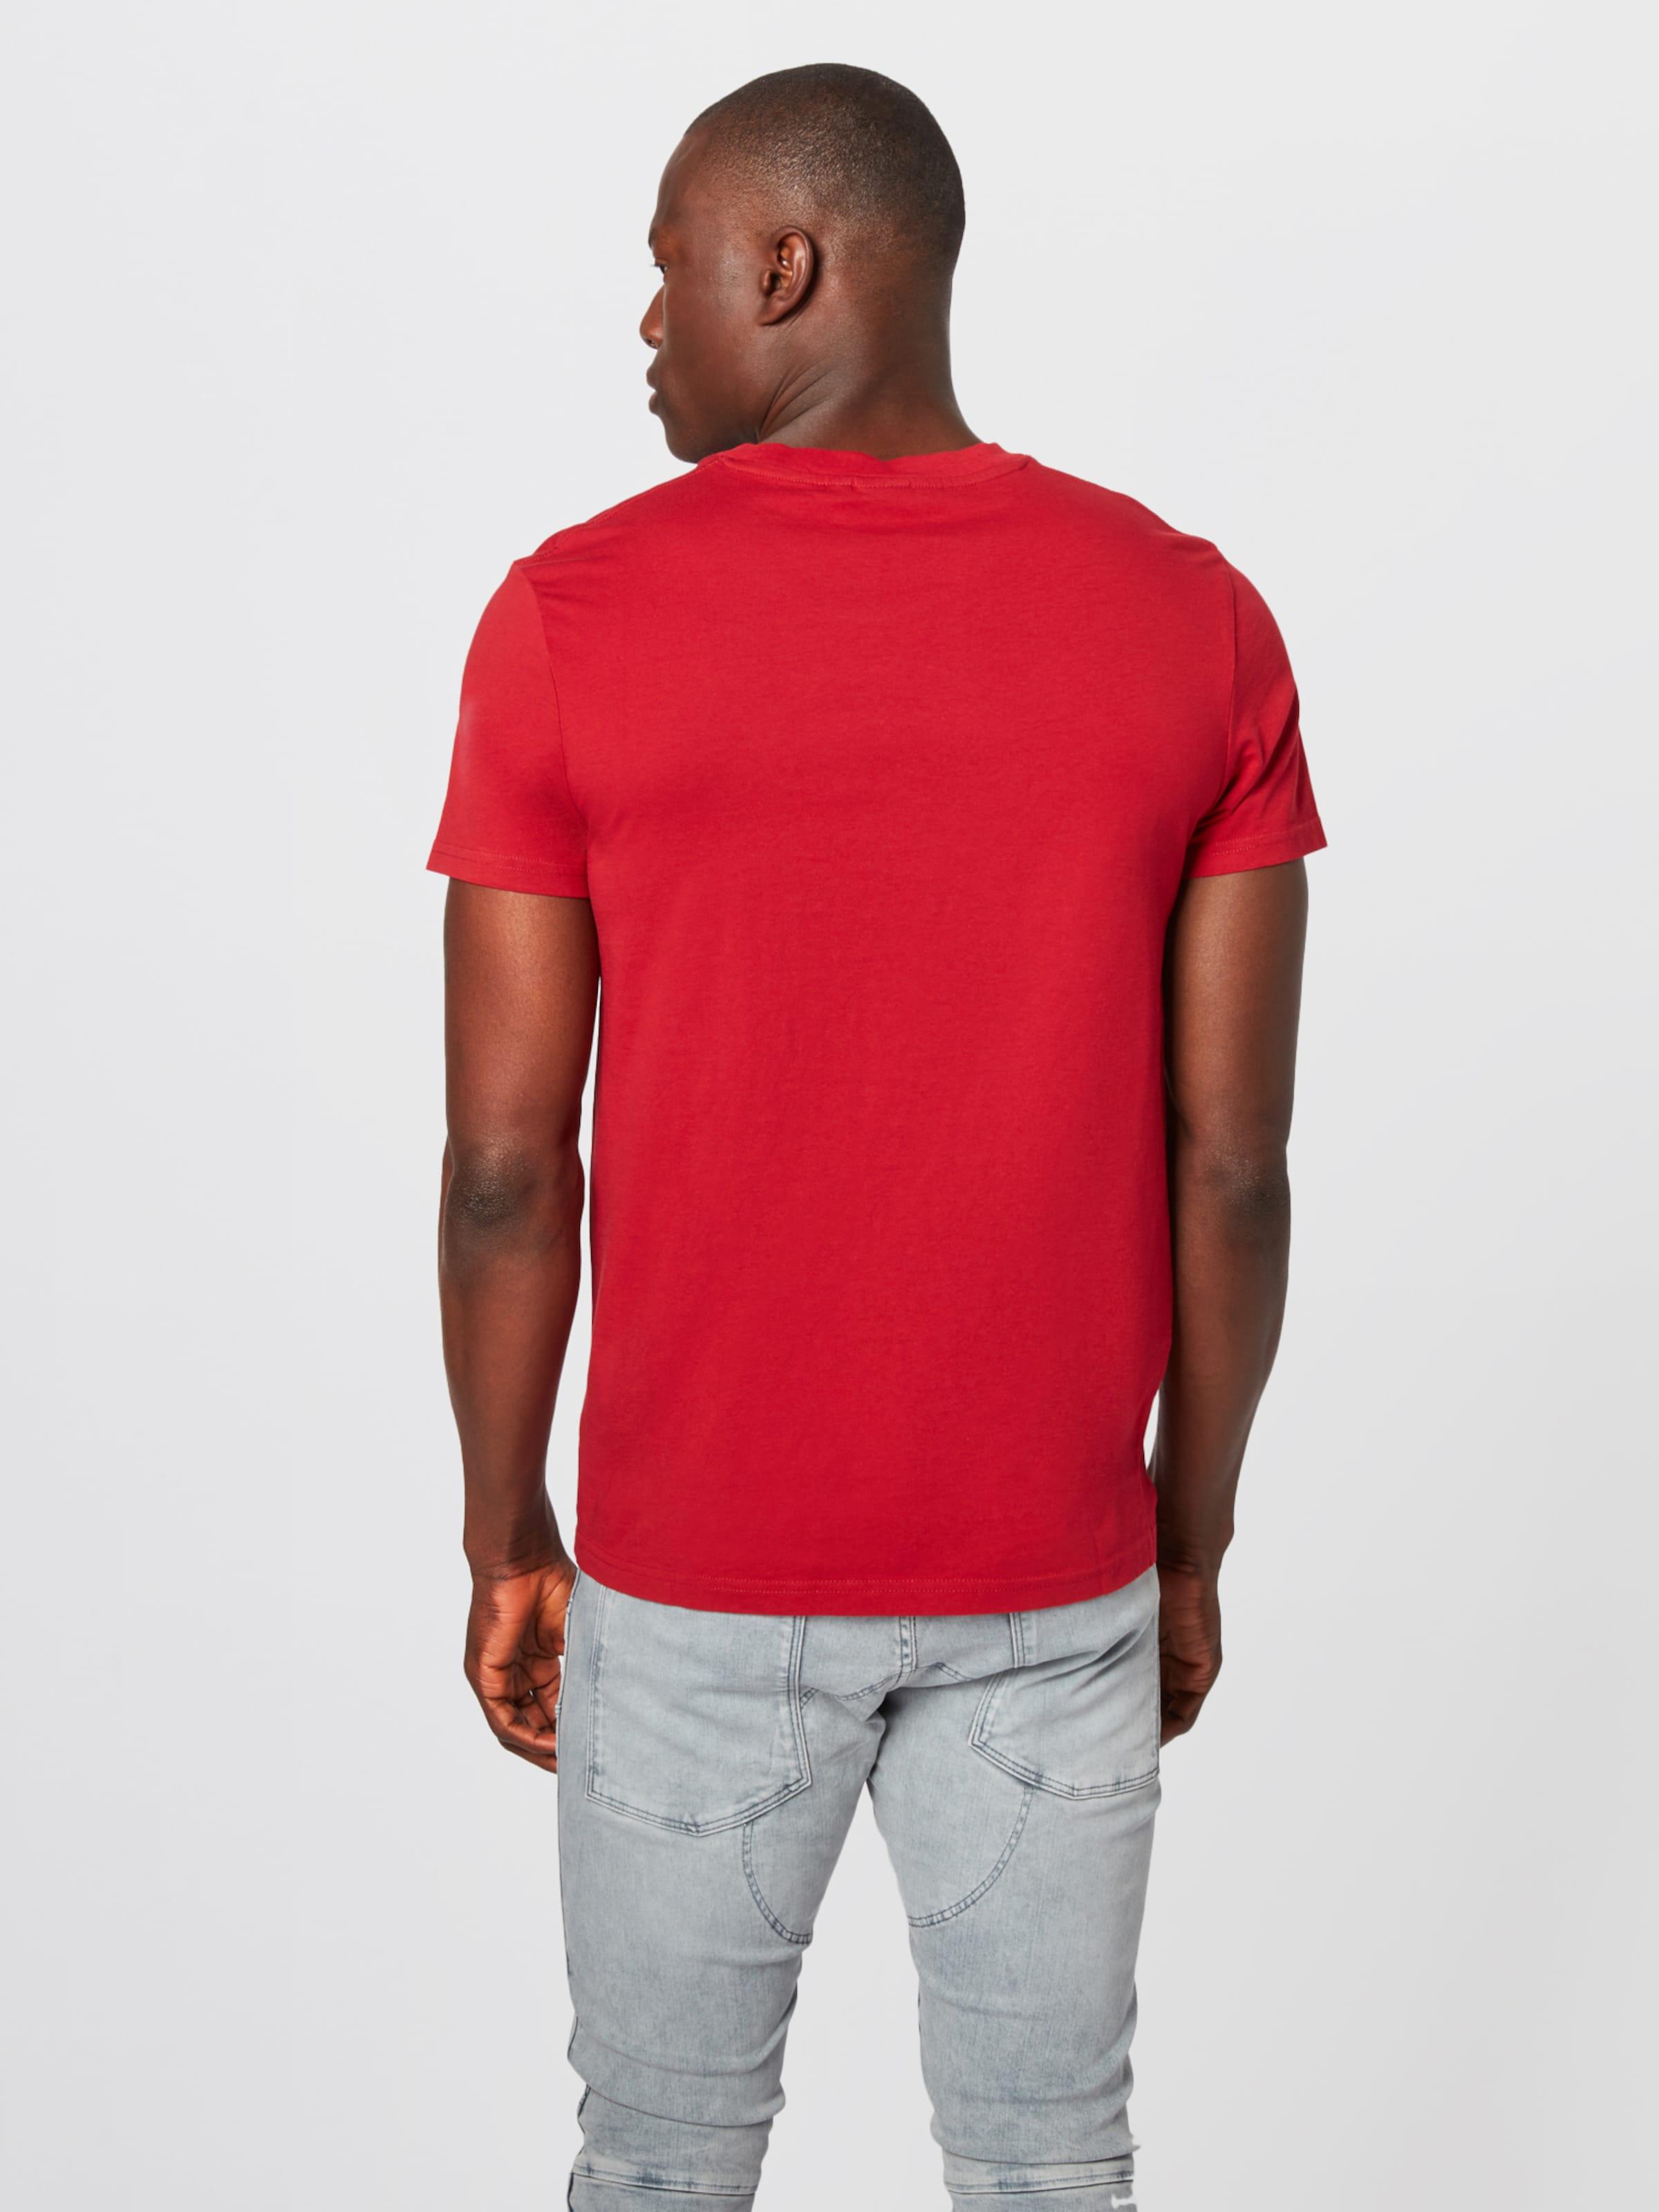 T star 8' Raw RougeBlanc shirt G En 'graphic VqzSMGUp